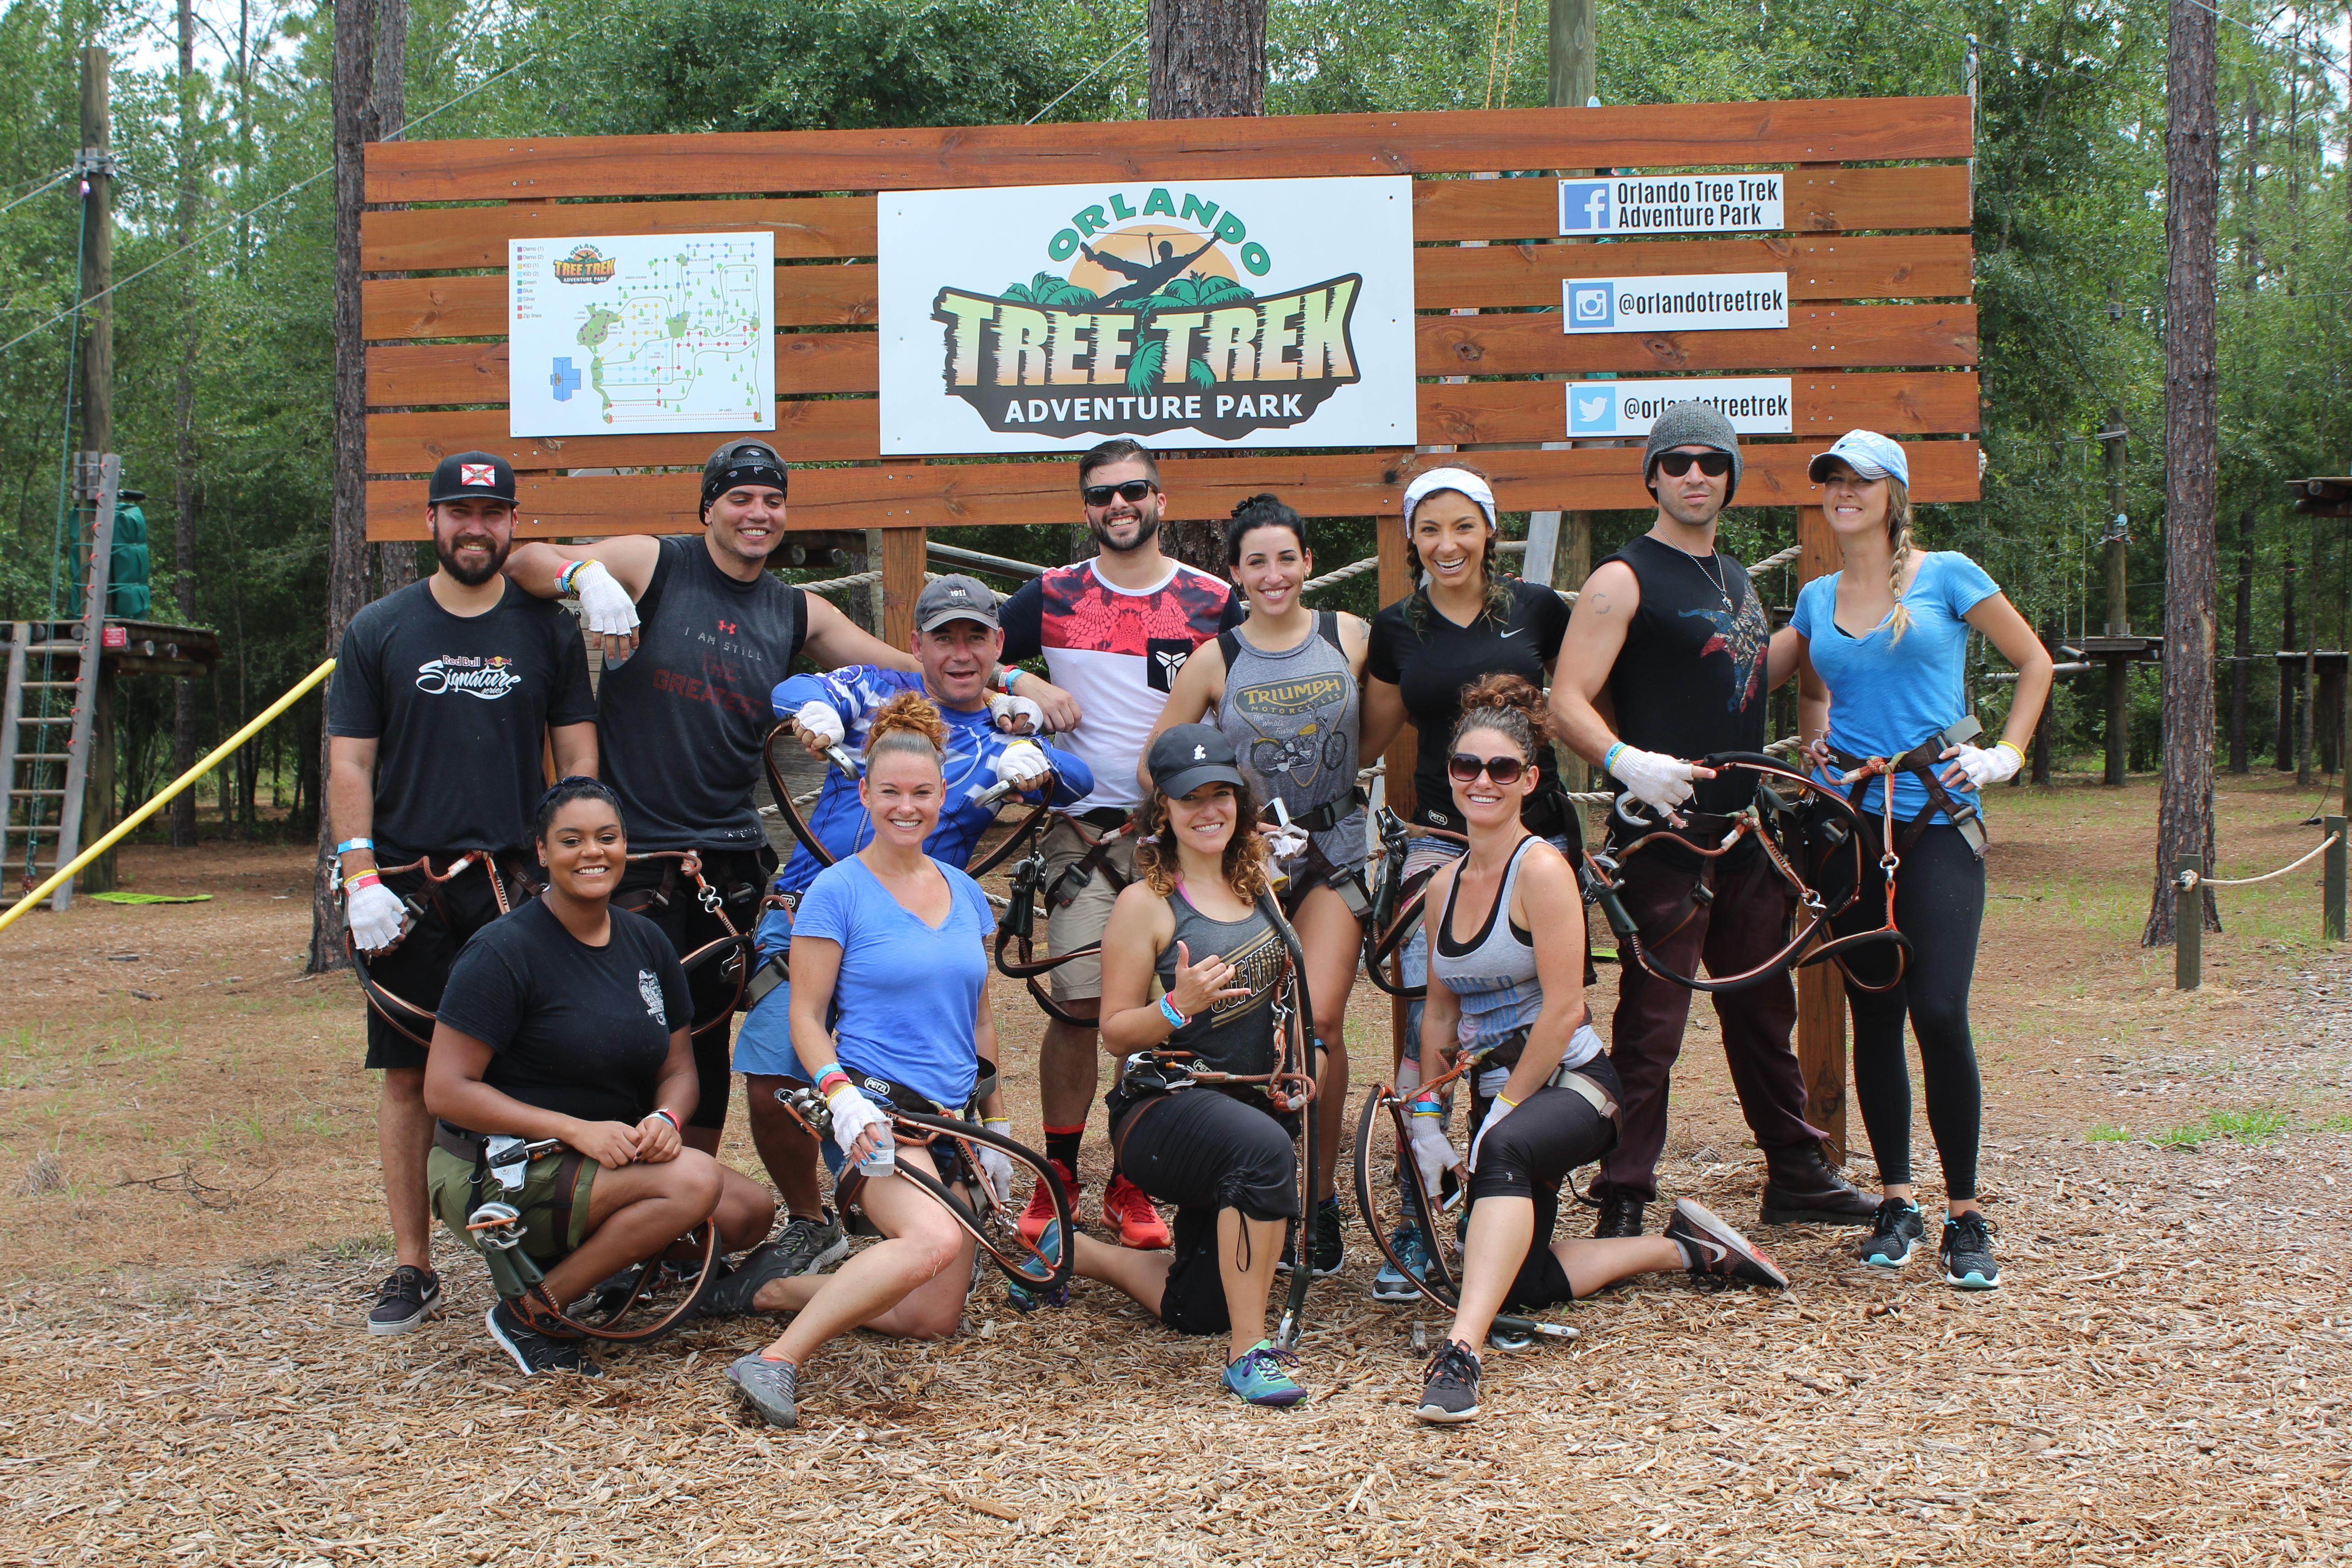 people in front of Orlando Tree Trek sign